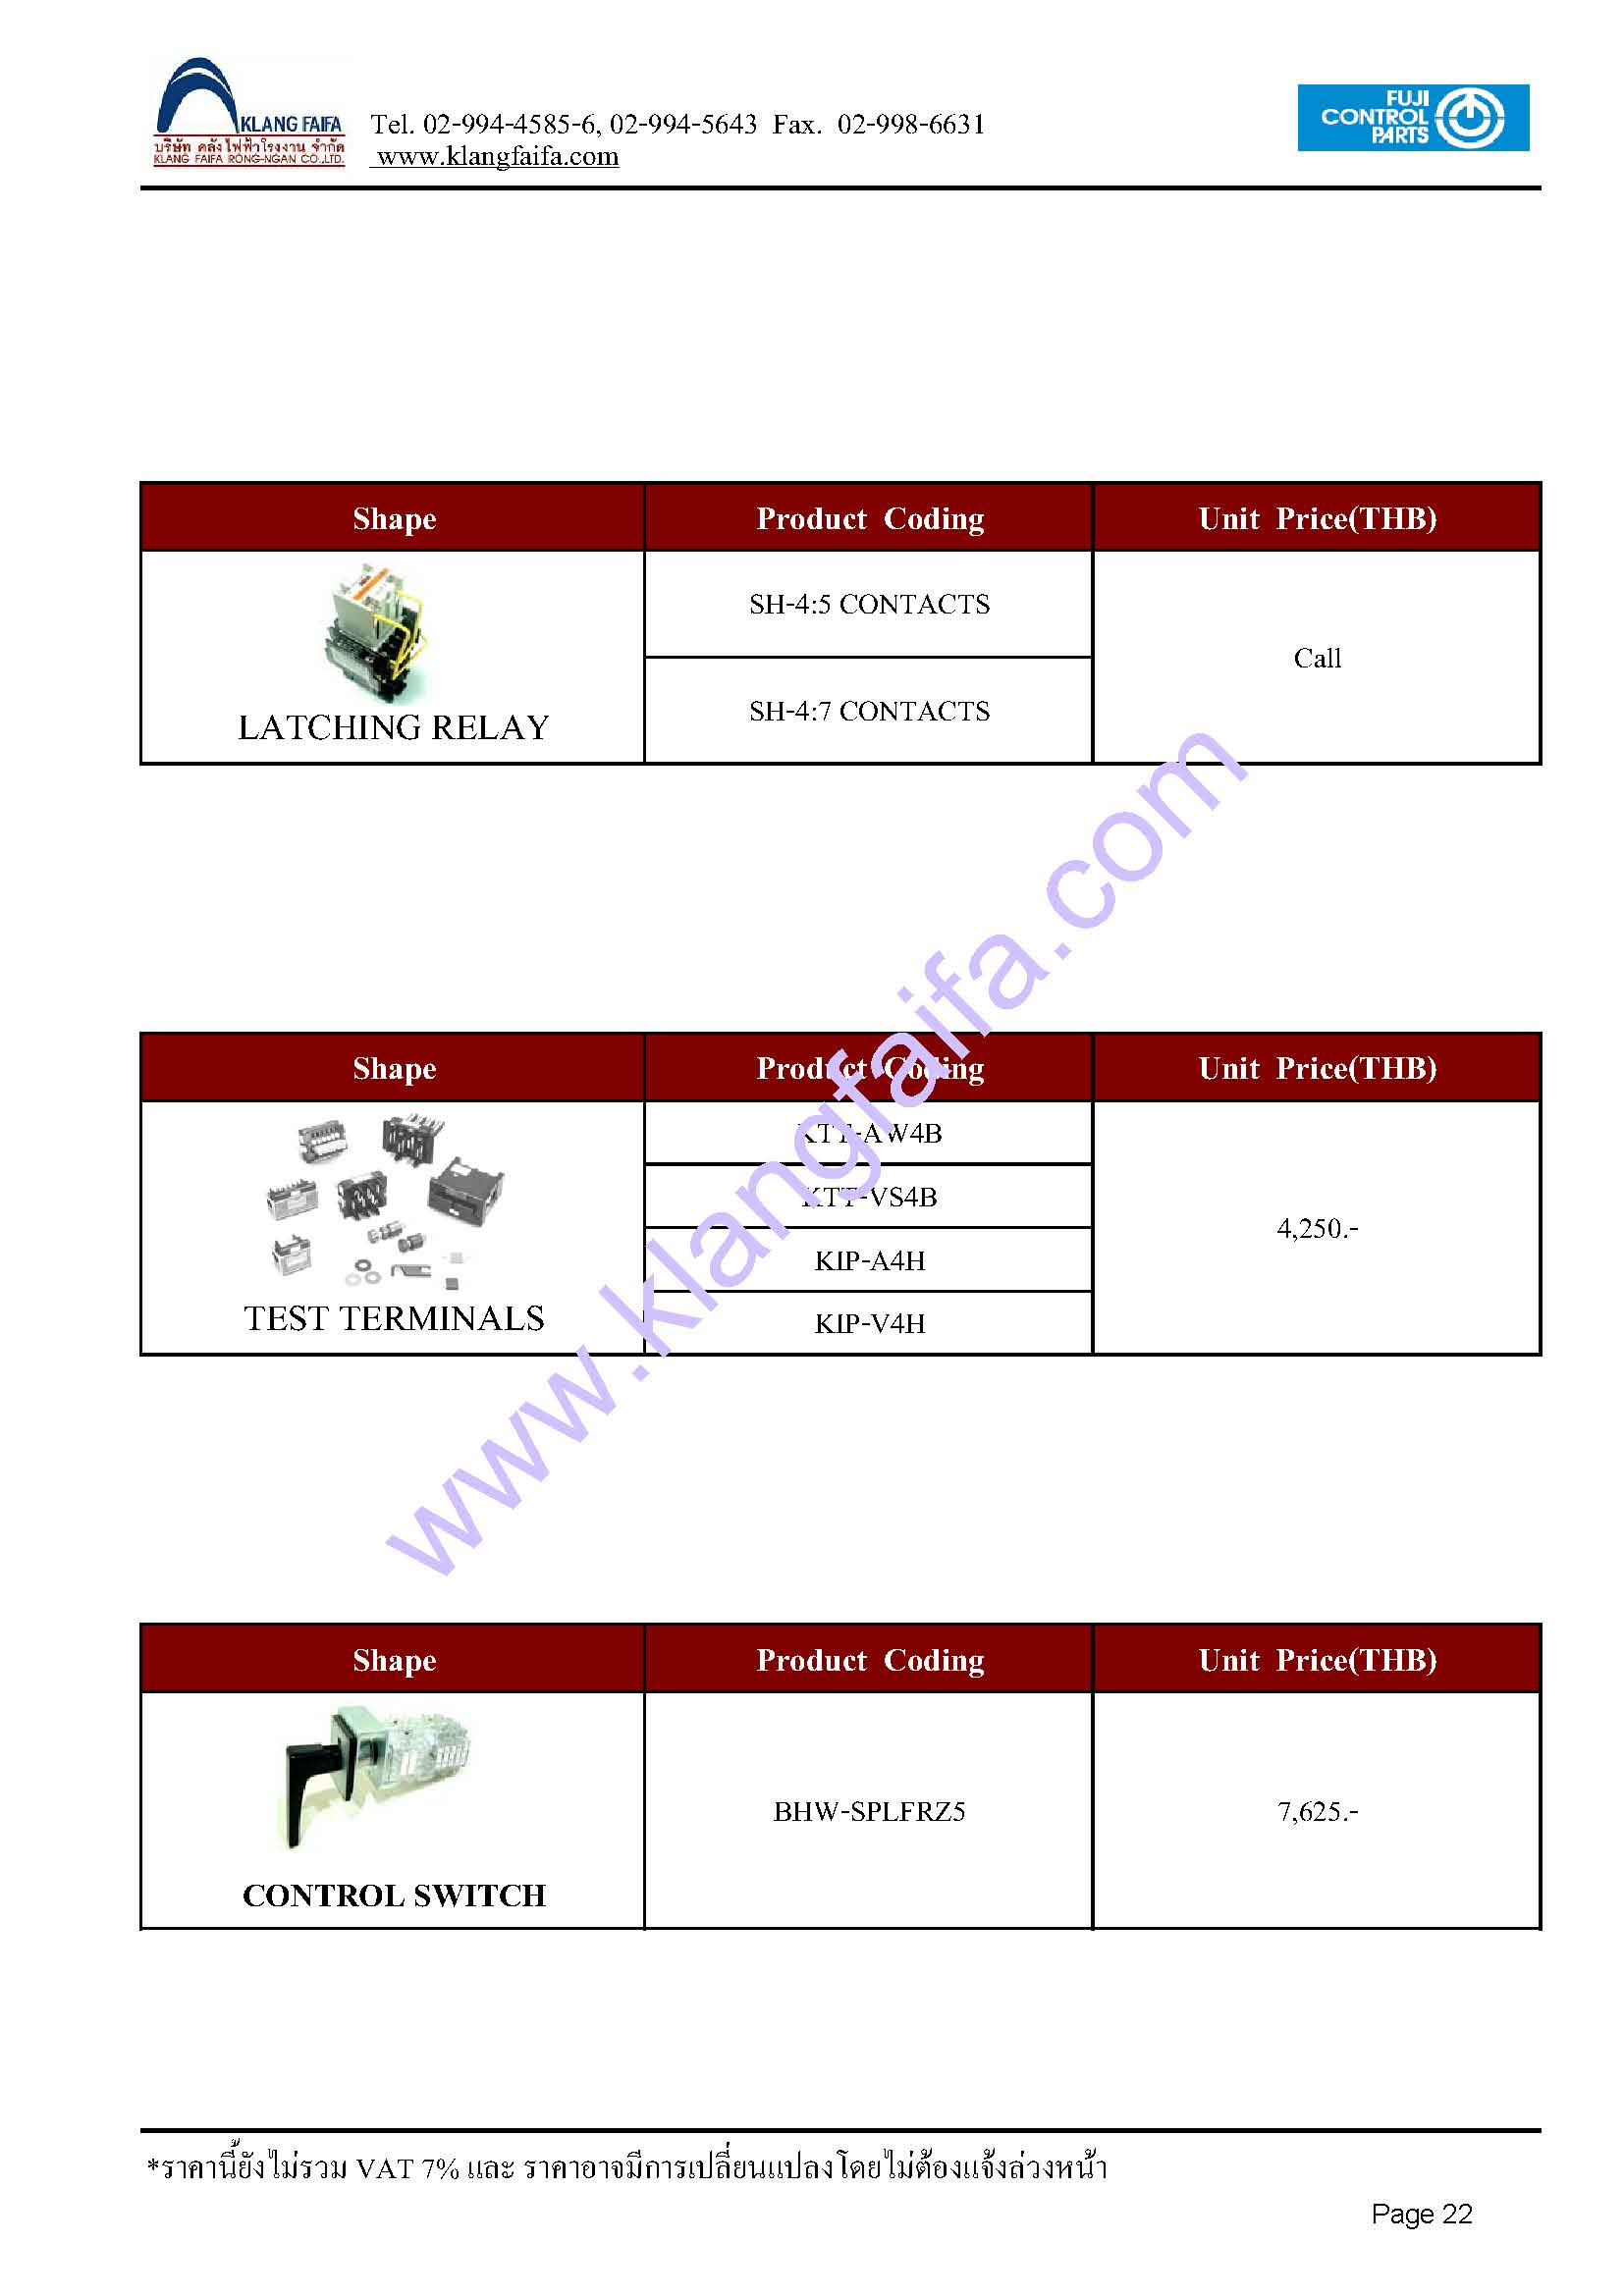 Control ต่างๆ ยี่ห้อEspan, Nova, Fuji โดยสินค้าที่จำหน่ายได้แก่ เช่น Annuciator(Espan), Viration Horn Power Buzzer, DC Voltage, Fast Trip Relay, Latching Relay , Pilot Lamp, LED Lamp , Push Button, Selector switch, Semaphore, Minuture Buzzer, Space heater, Termostat, Test Terminal Block, Limited switch, Universal Outlet, Service lamp , Panel meter, Fuse Disconnector, Cureent Transformer, Cam switch, Hygrostat, DC shunt, Industrial power relay, Timer reay , Discrepancy switch, Line lamp